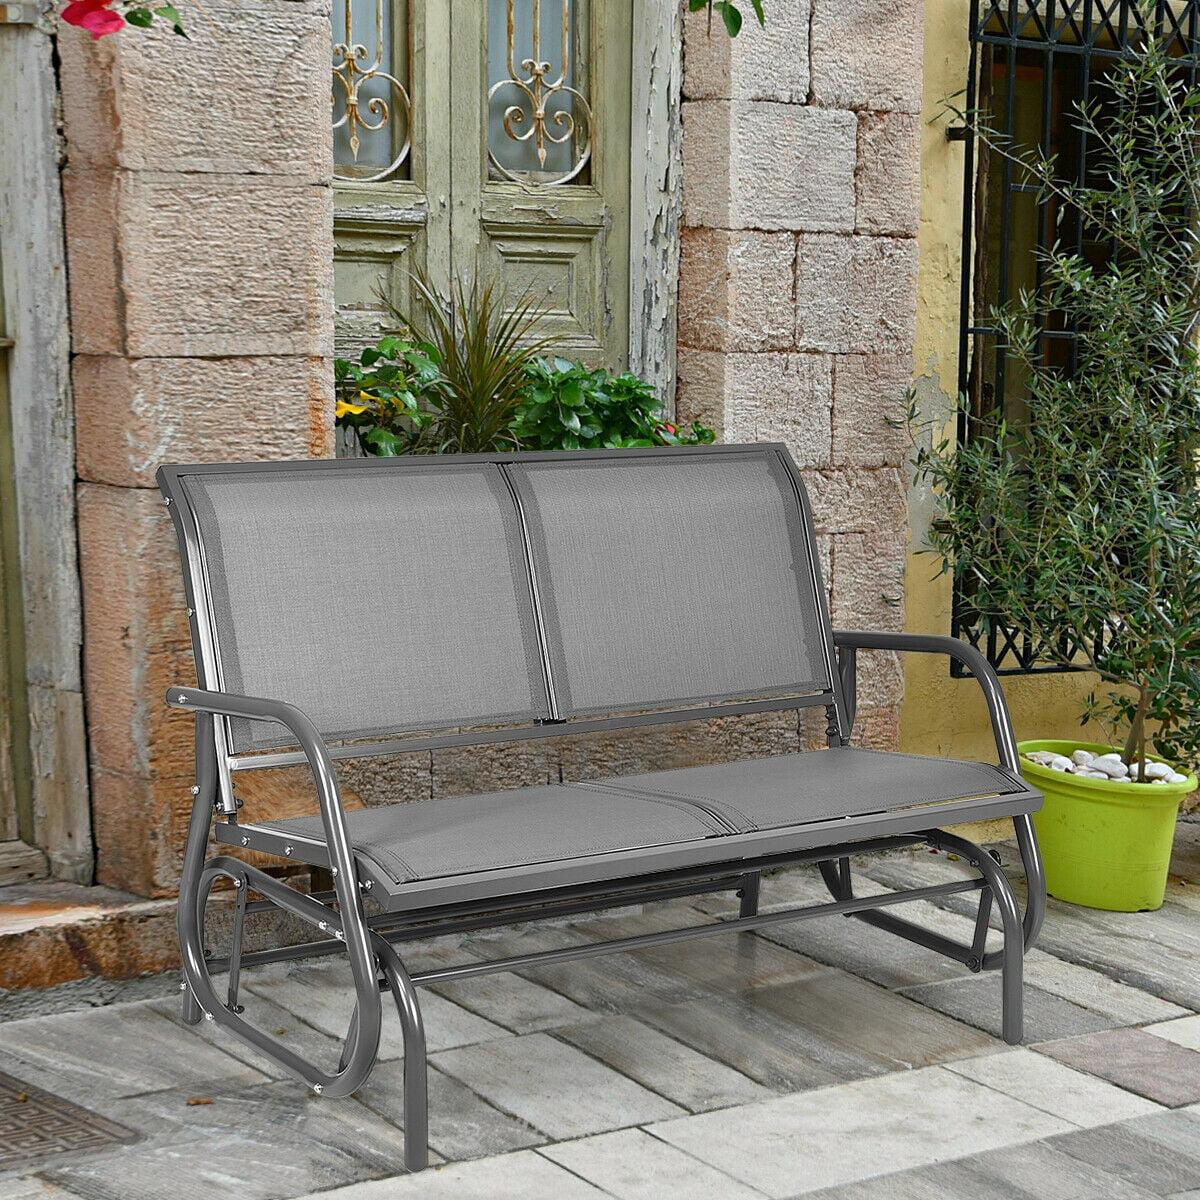 gymax 48 outdoor patio swing glider bench chair loveseat rocker lounge backyard grey walmart com